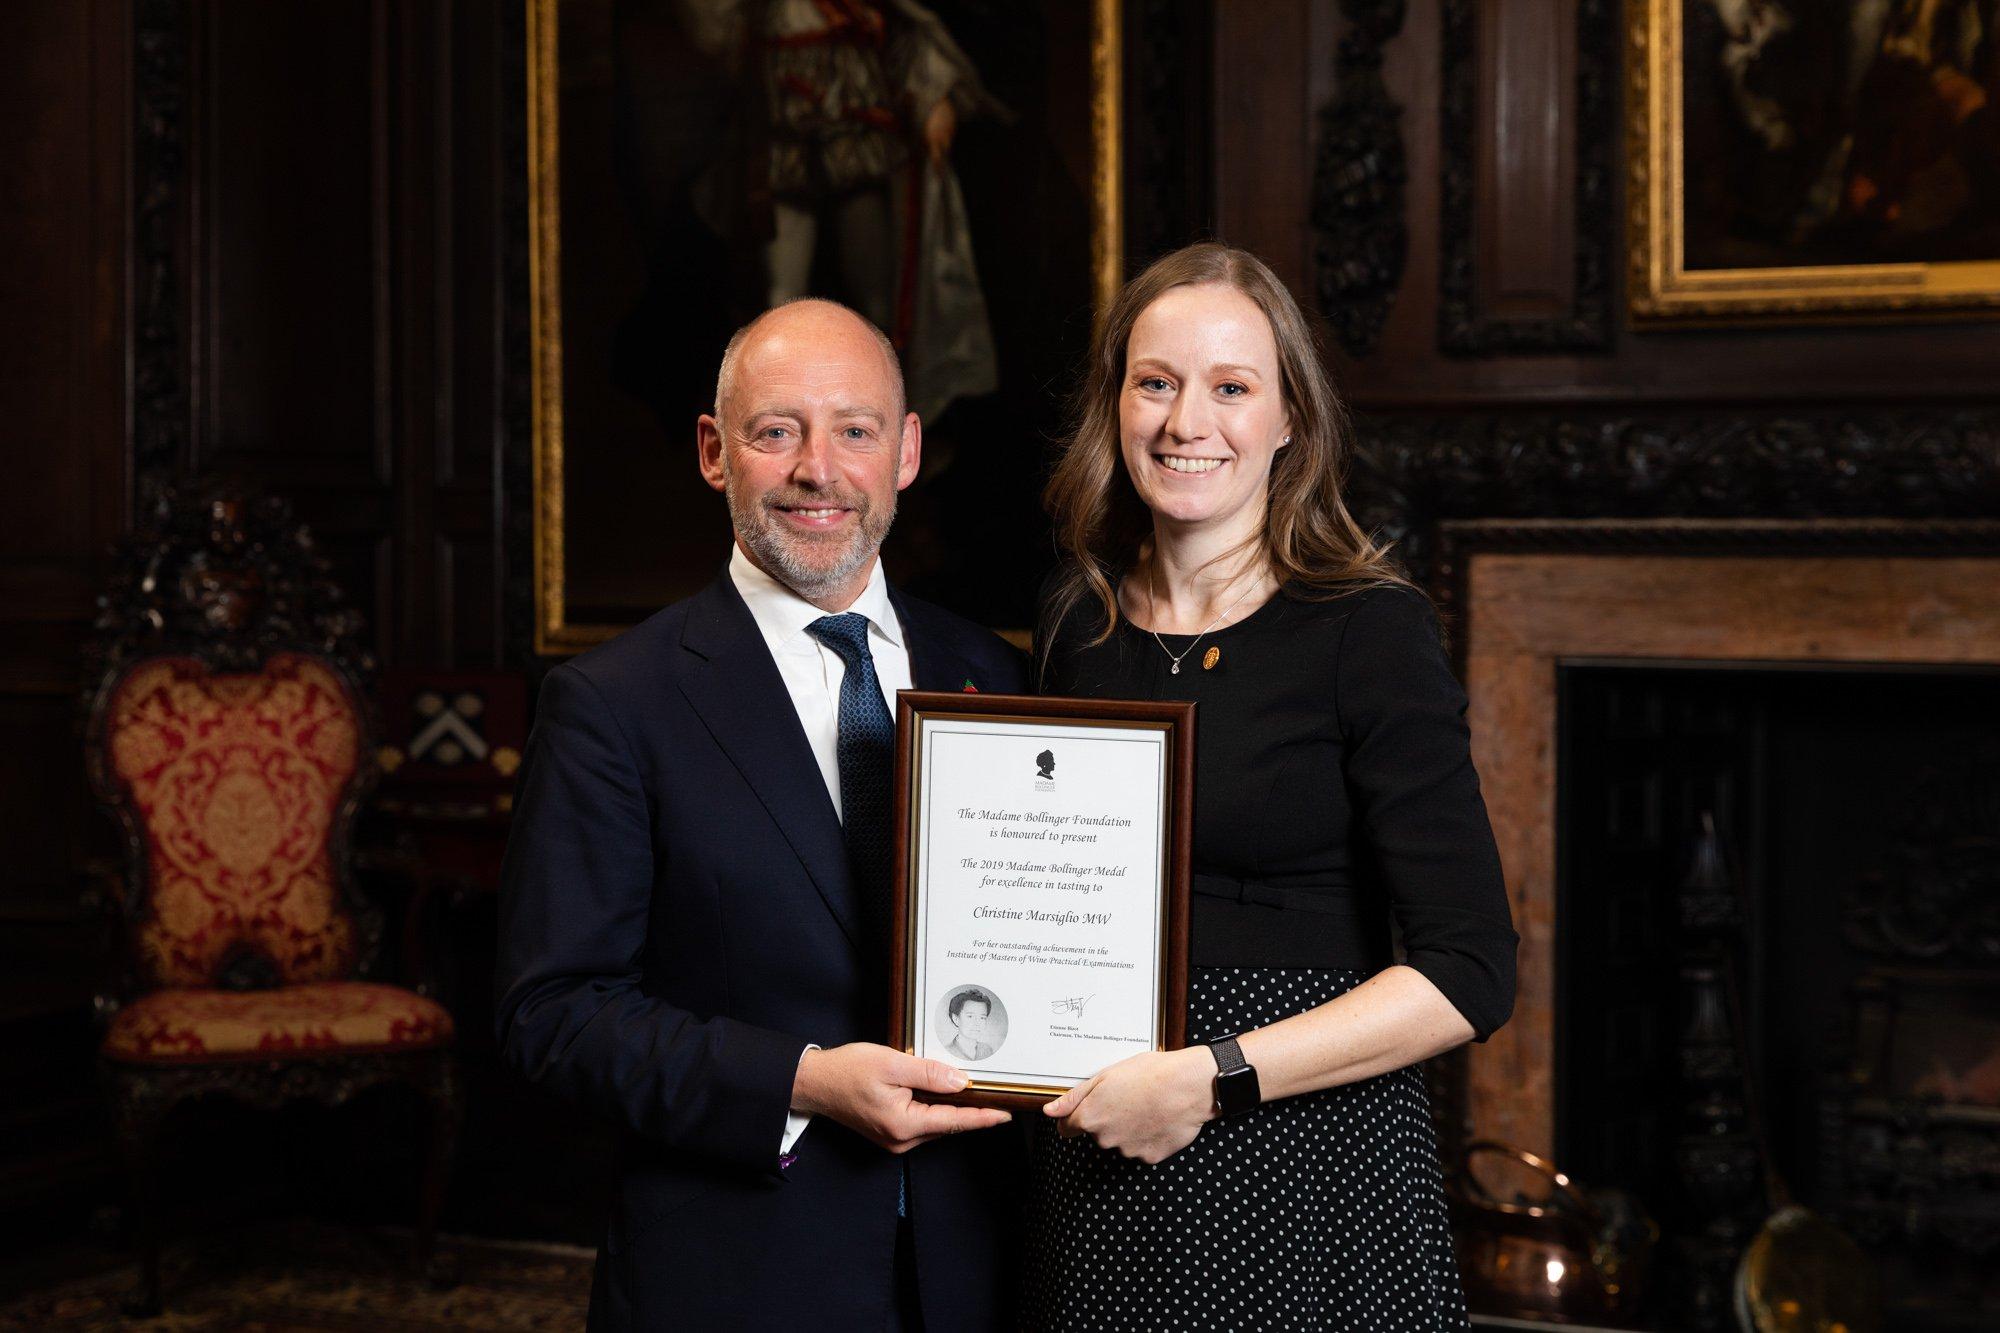 Christine Marsiglio MW named the 2019 Madame Bollinger Medal winner